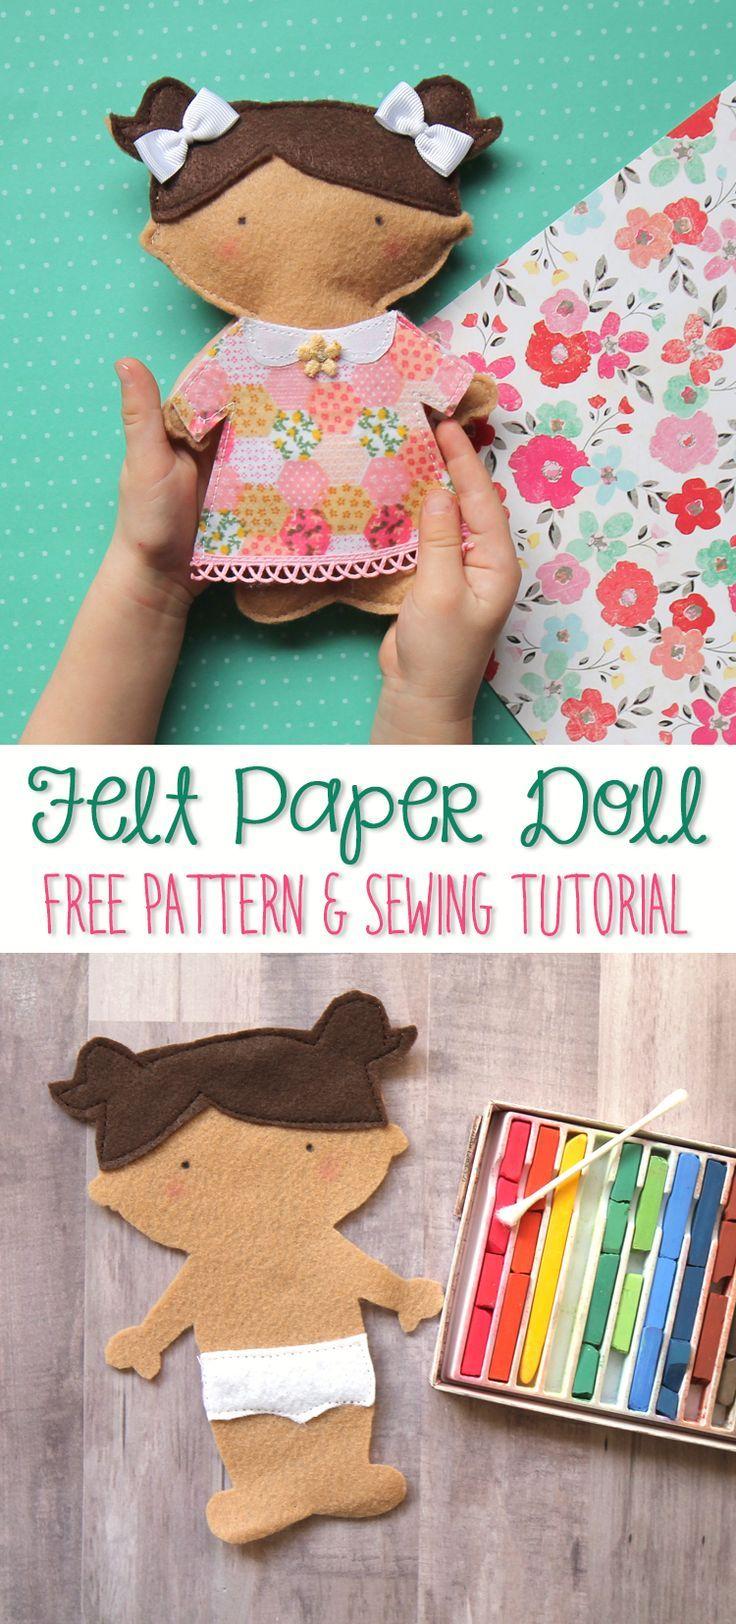 Felt Paper Doll Tutorial + Free Pattern | INSPIRATION: Sewing ...